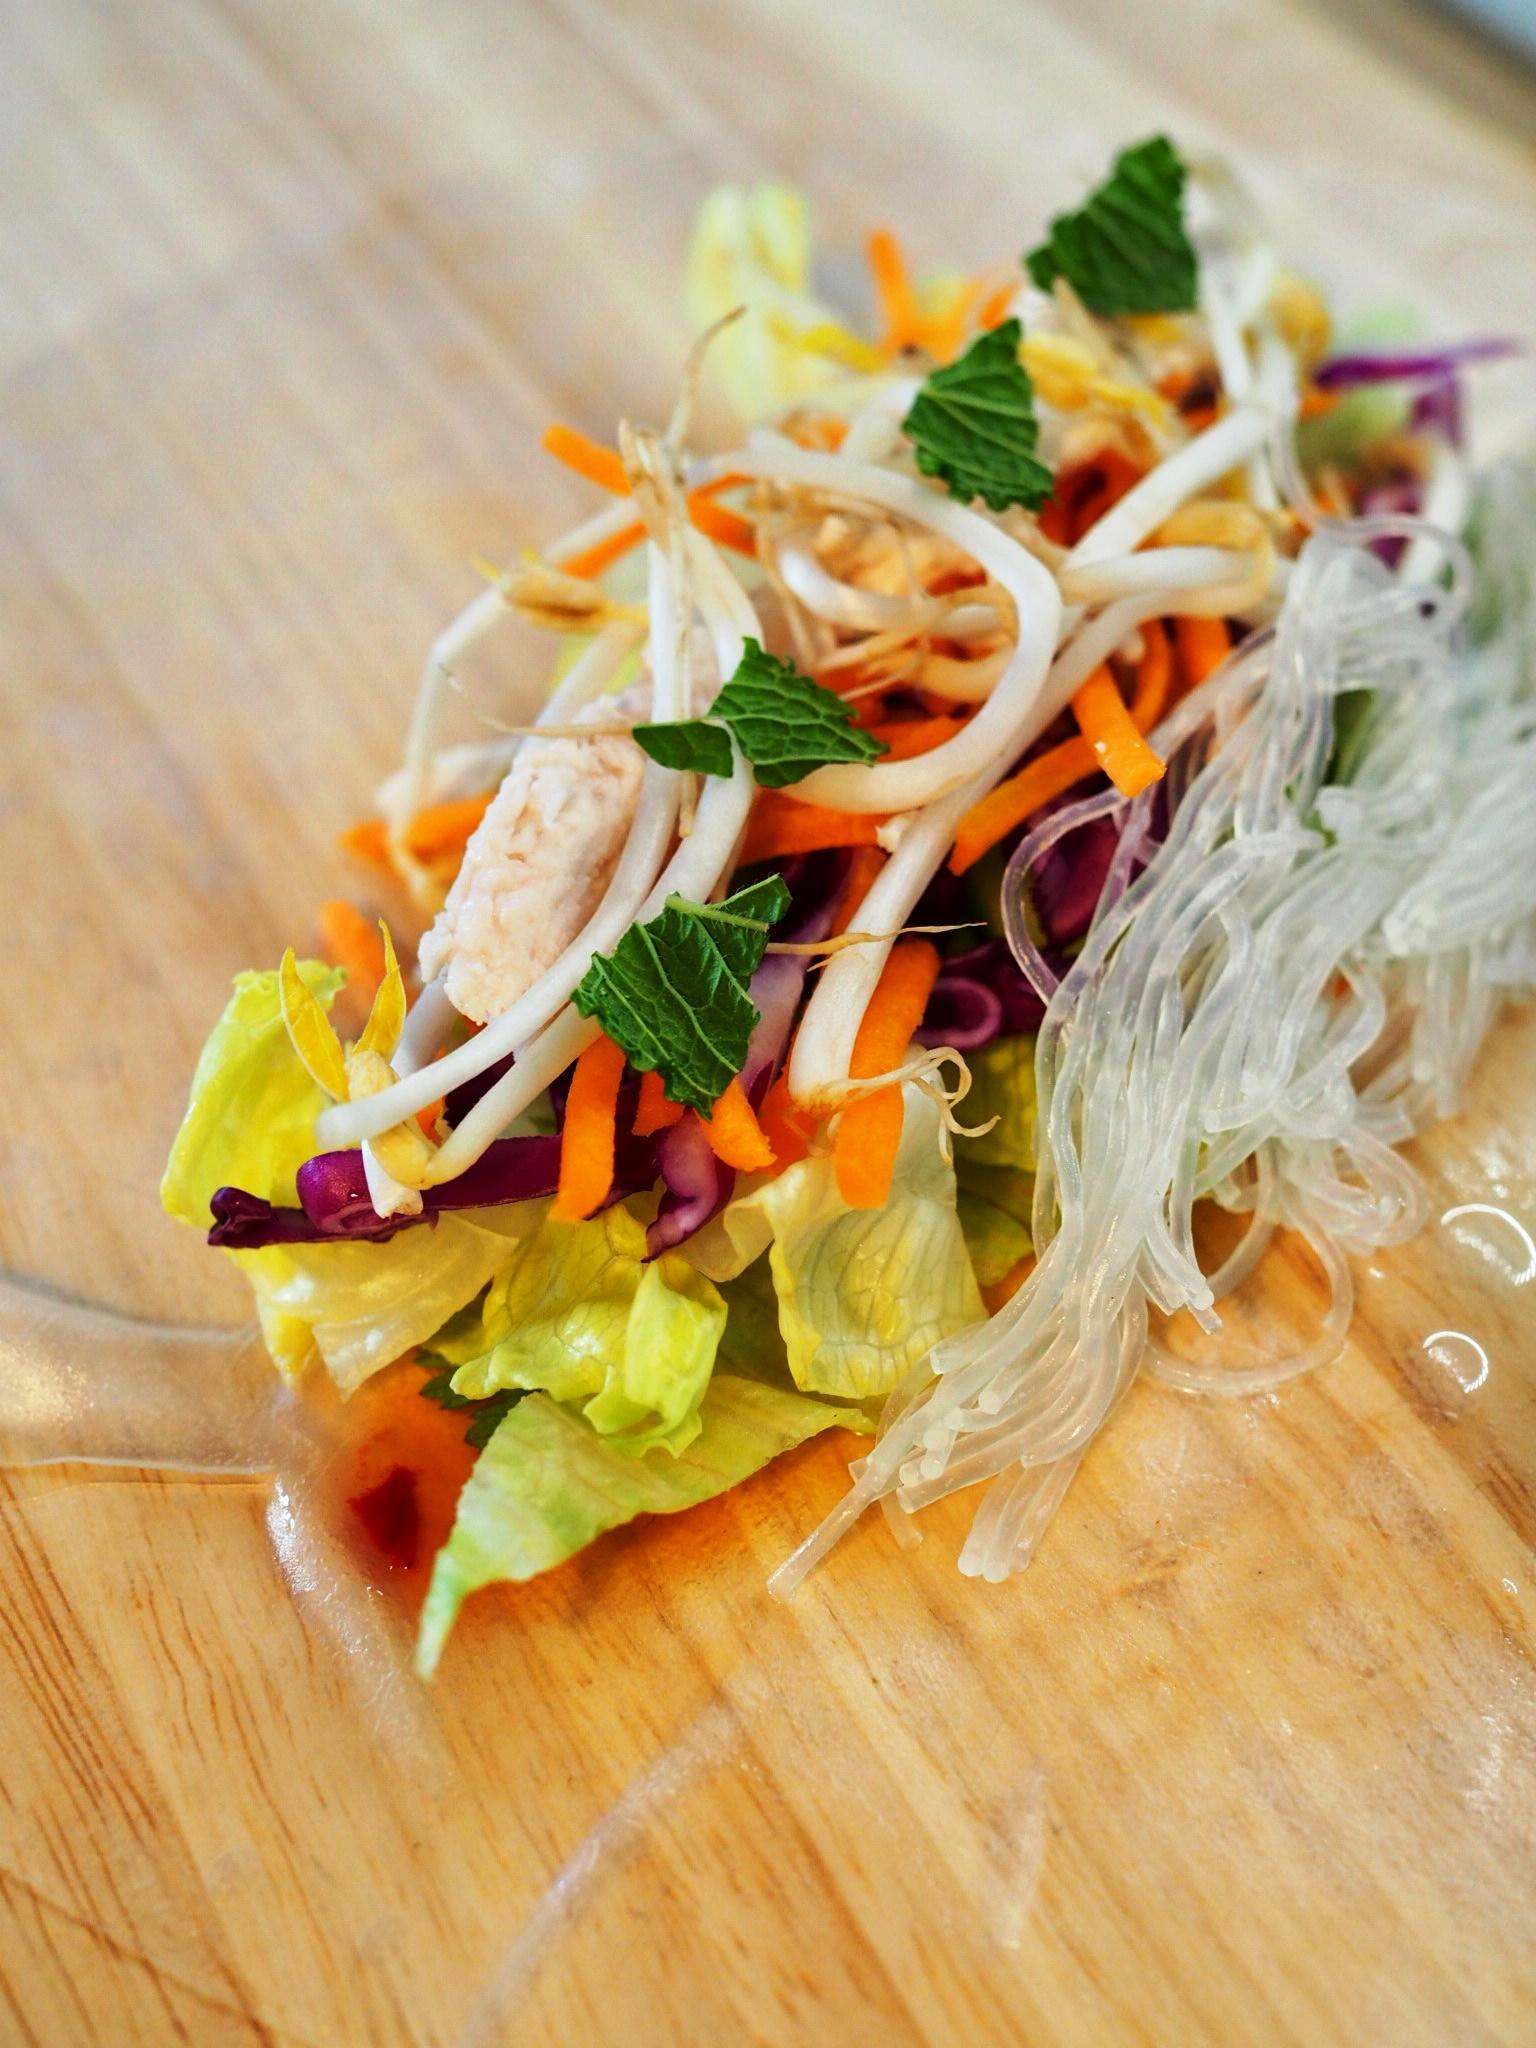 Vietnamesische Sommerrollen mit Erdnuss-Limetten-Dip